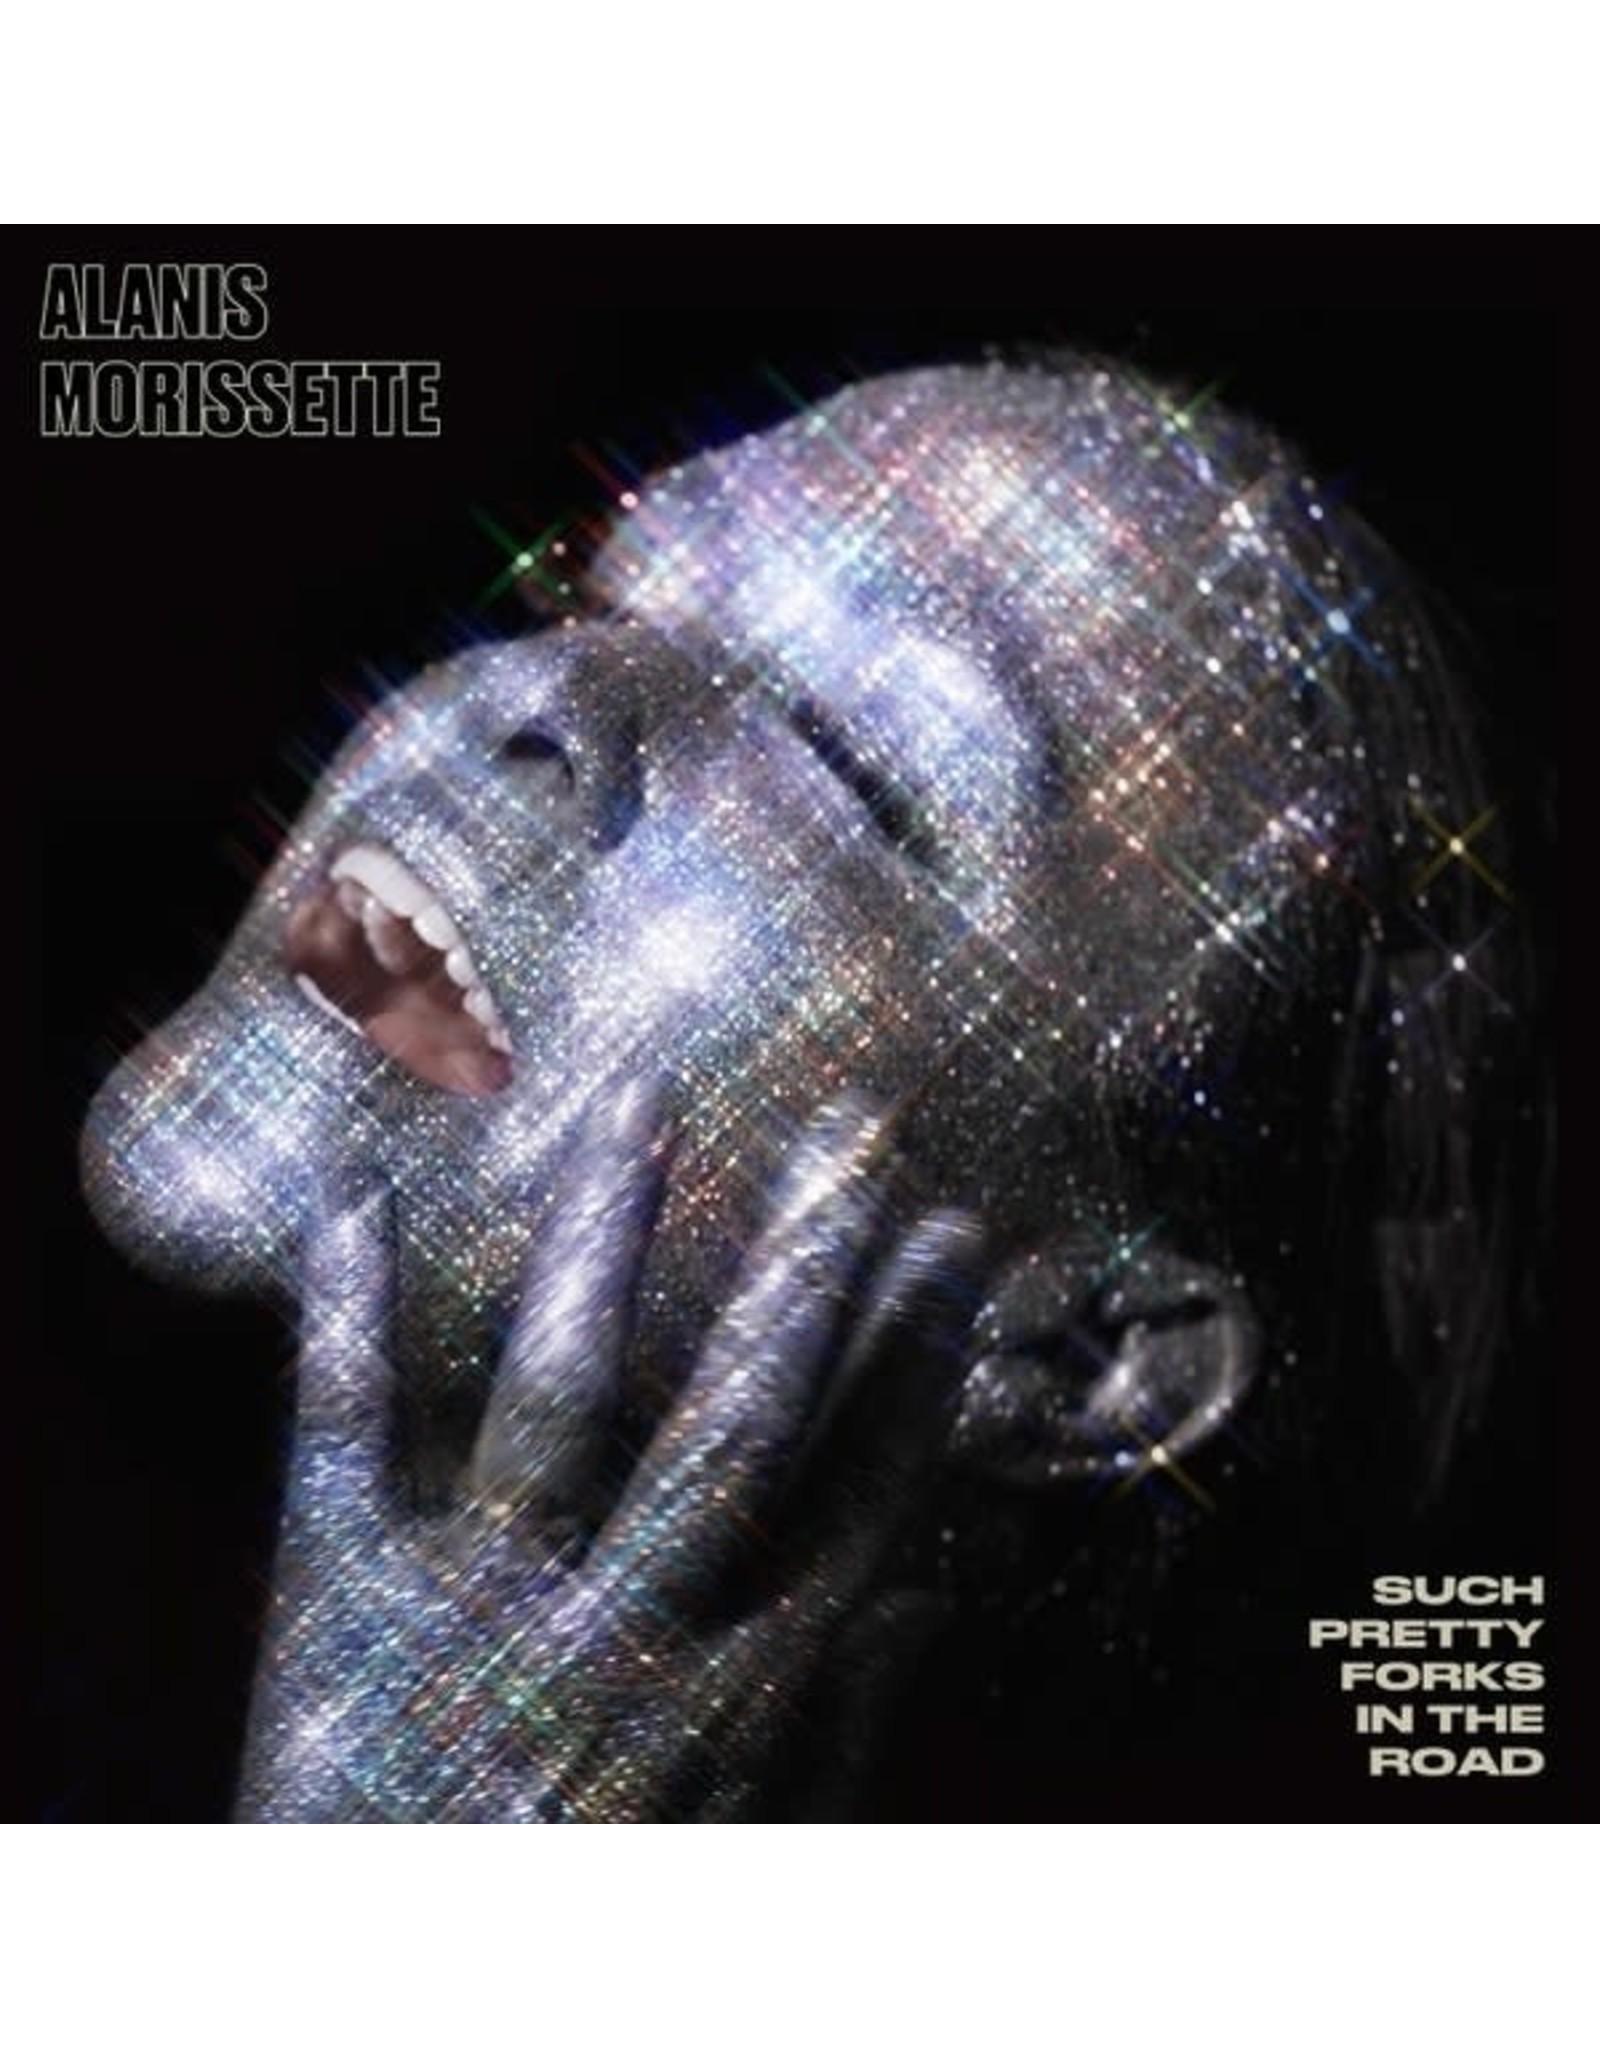 Morissette, Alanis - Such Pretty Forks in the Road LP (coke bottle clear)